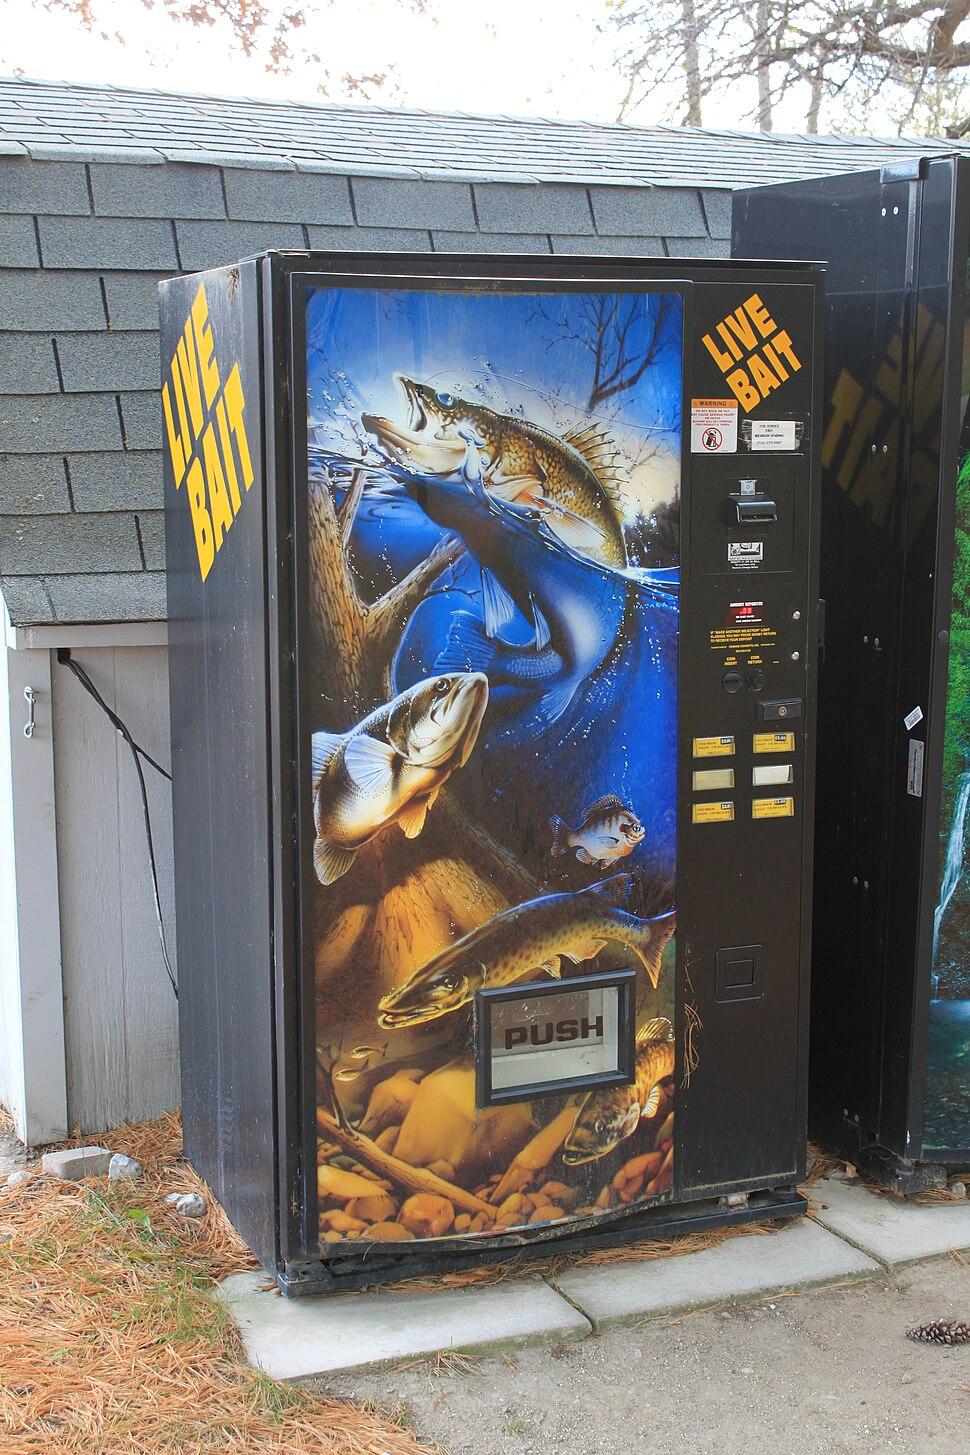 Live bait vending machine Brighton Recreation Area